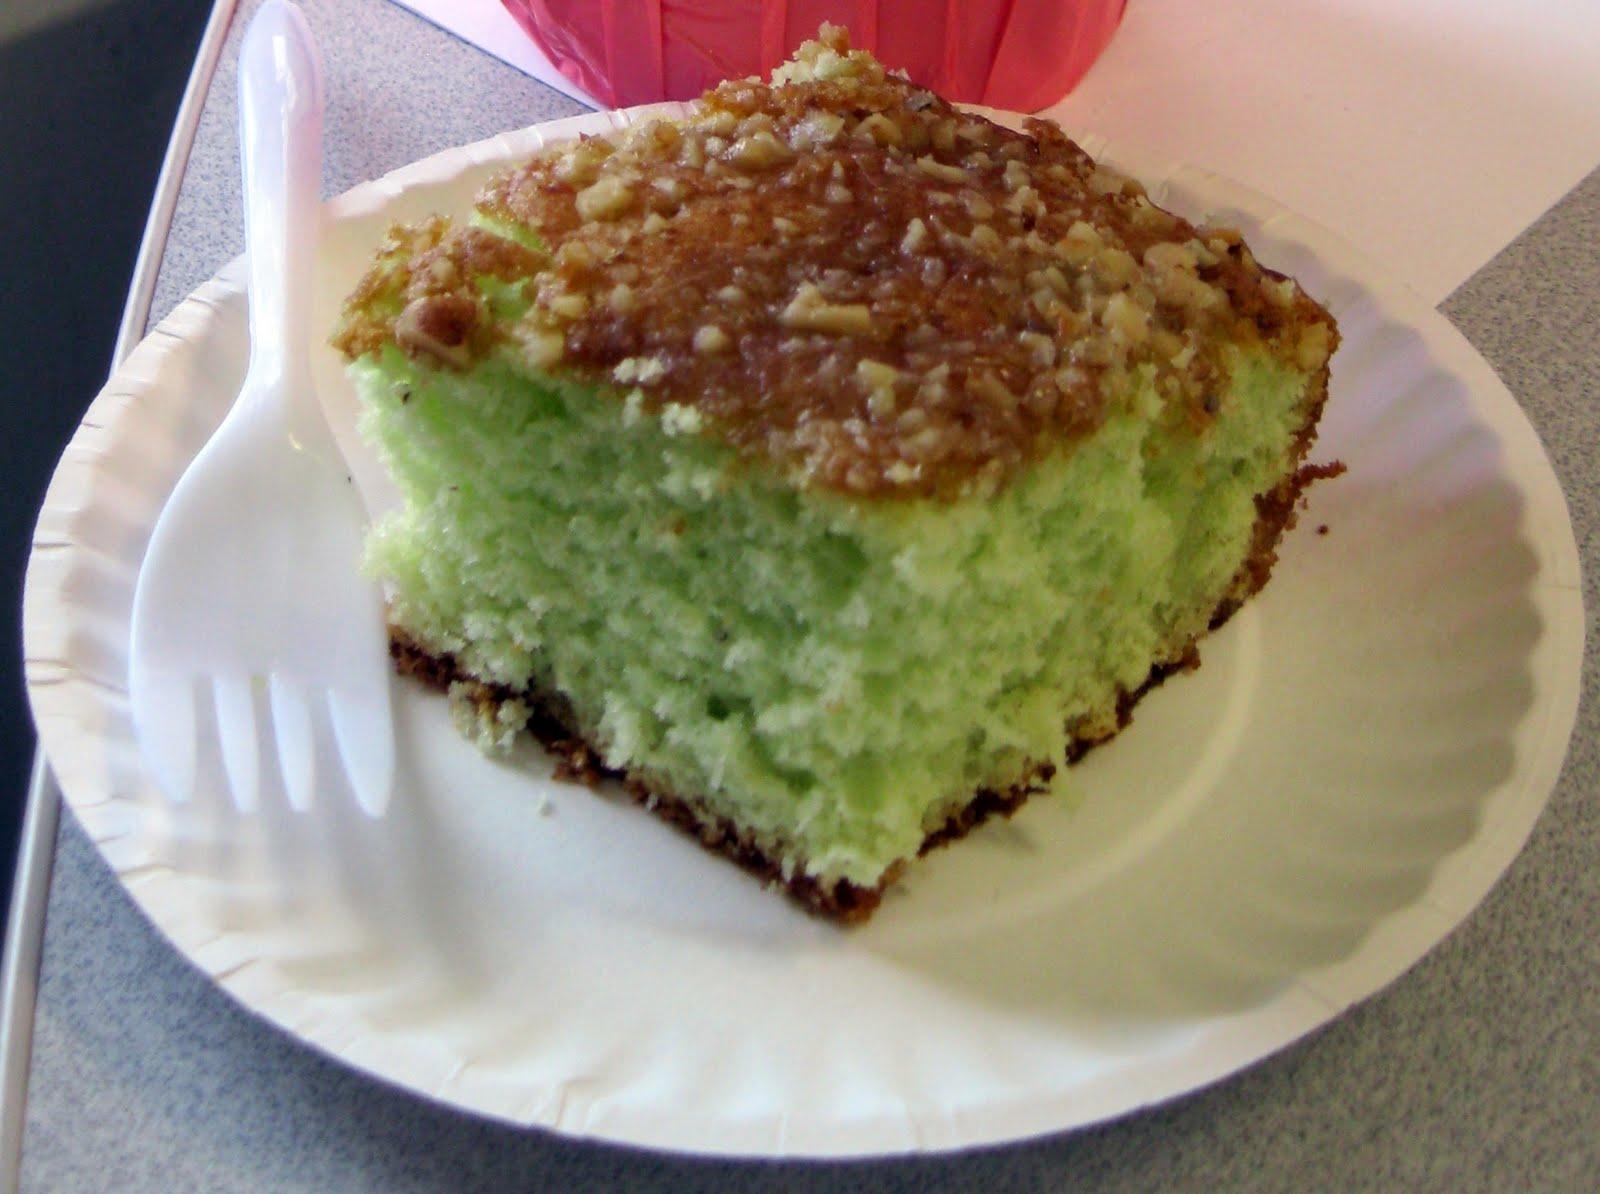 Adirondack Baker Office Food And Pistachio Cake